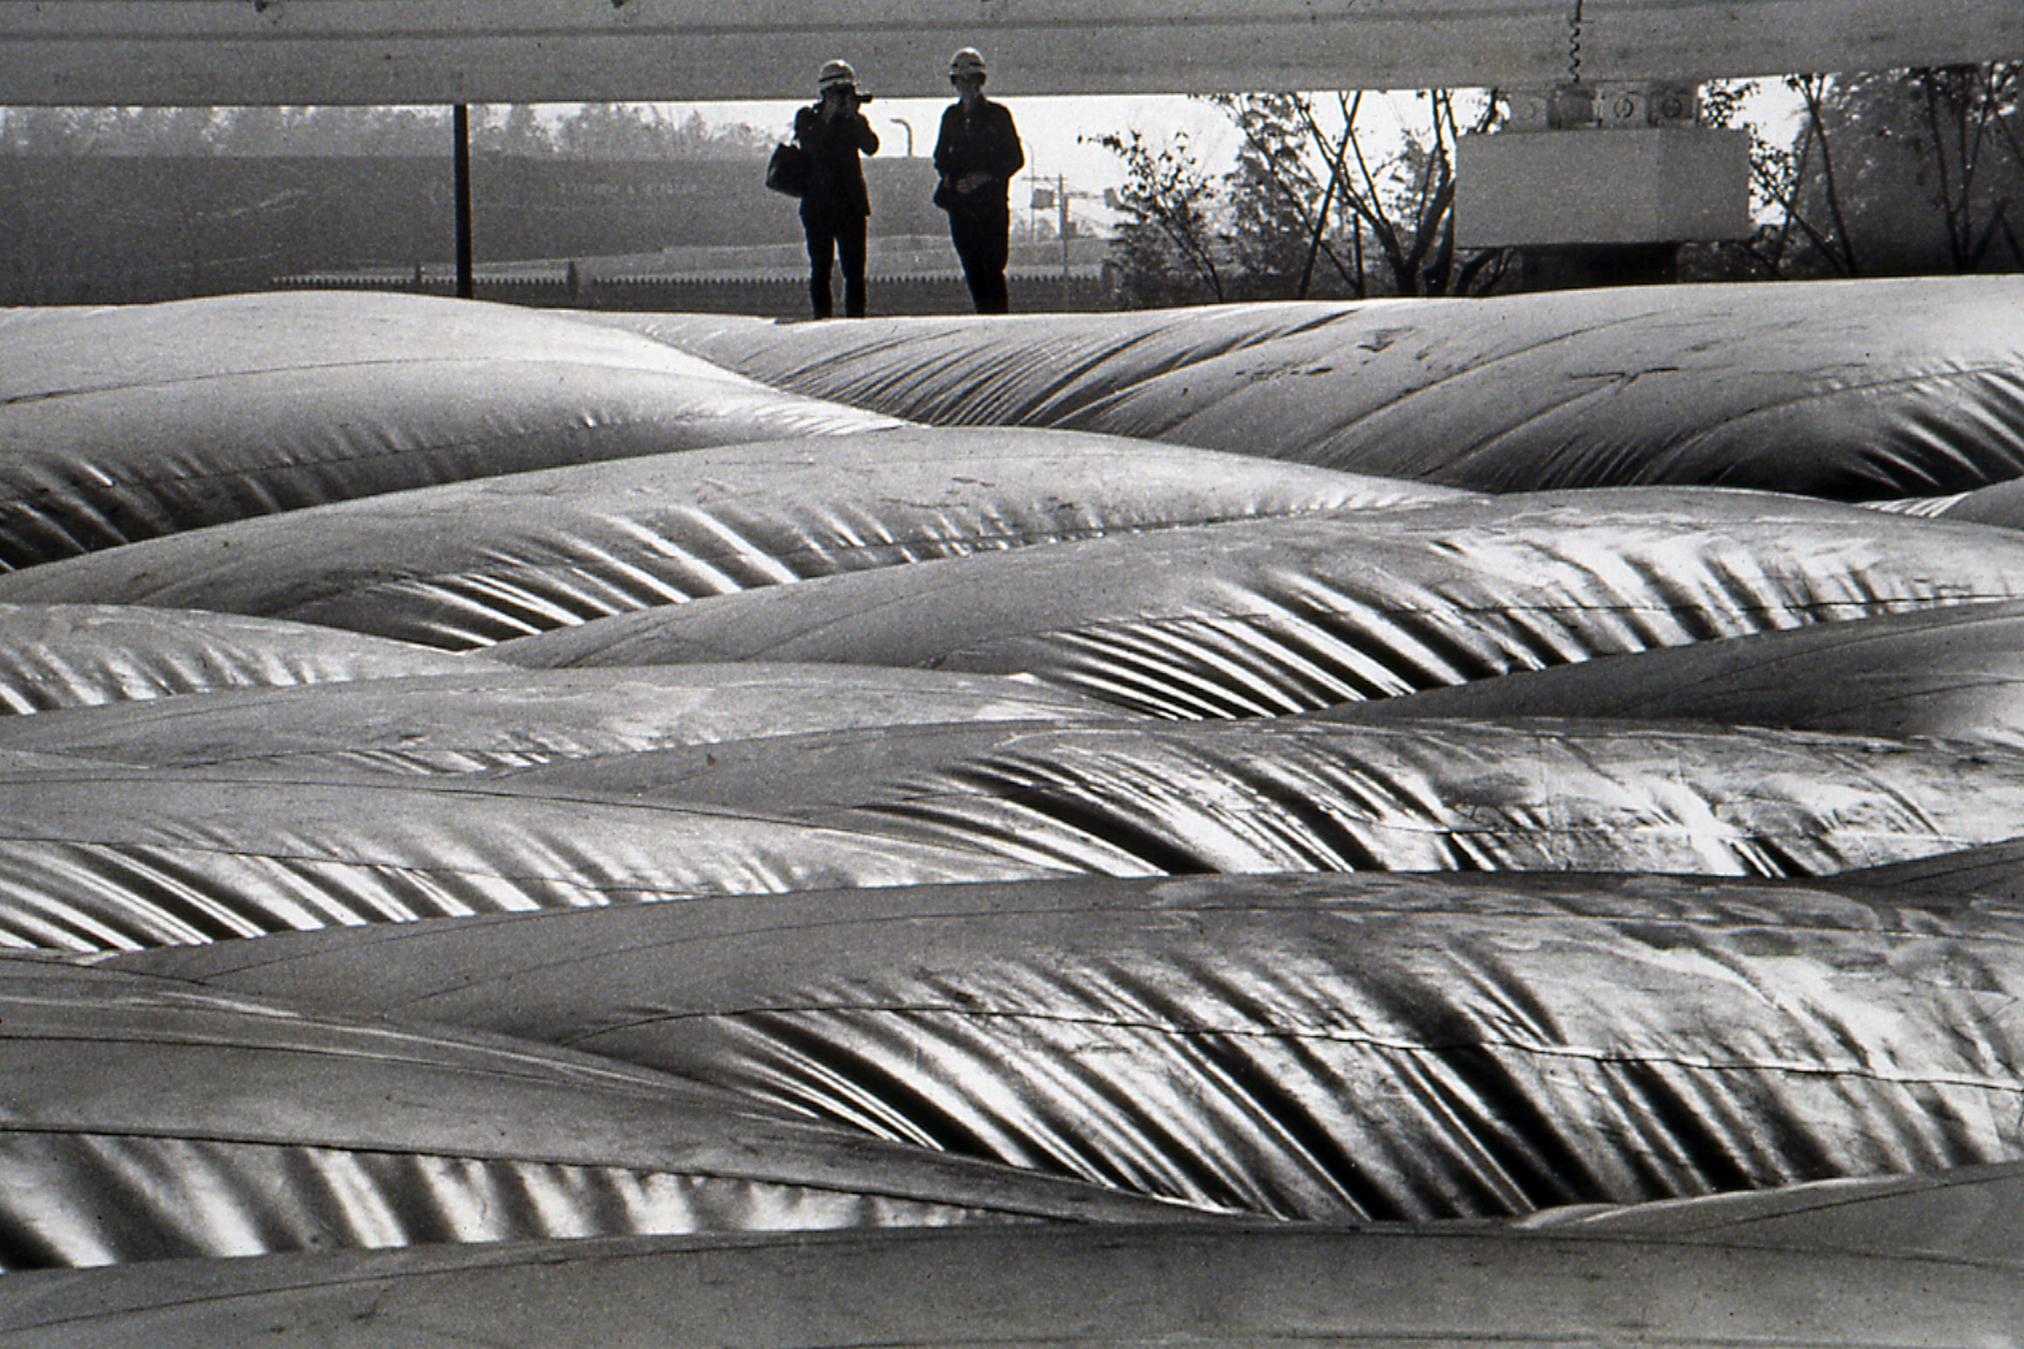 Us Pavilion, EXPO'70, Osaka World's Fair